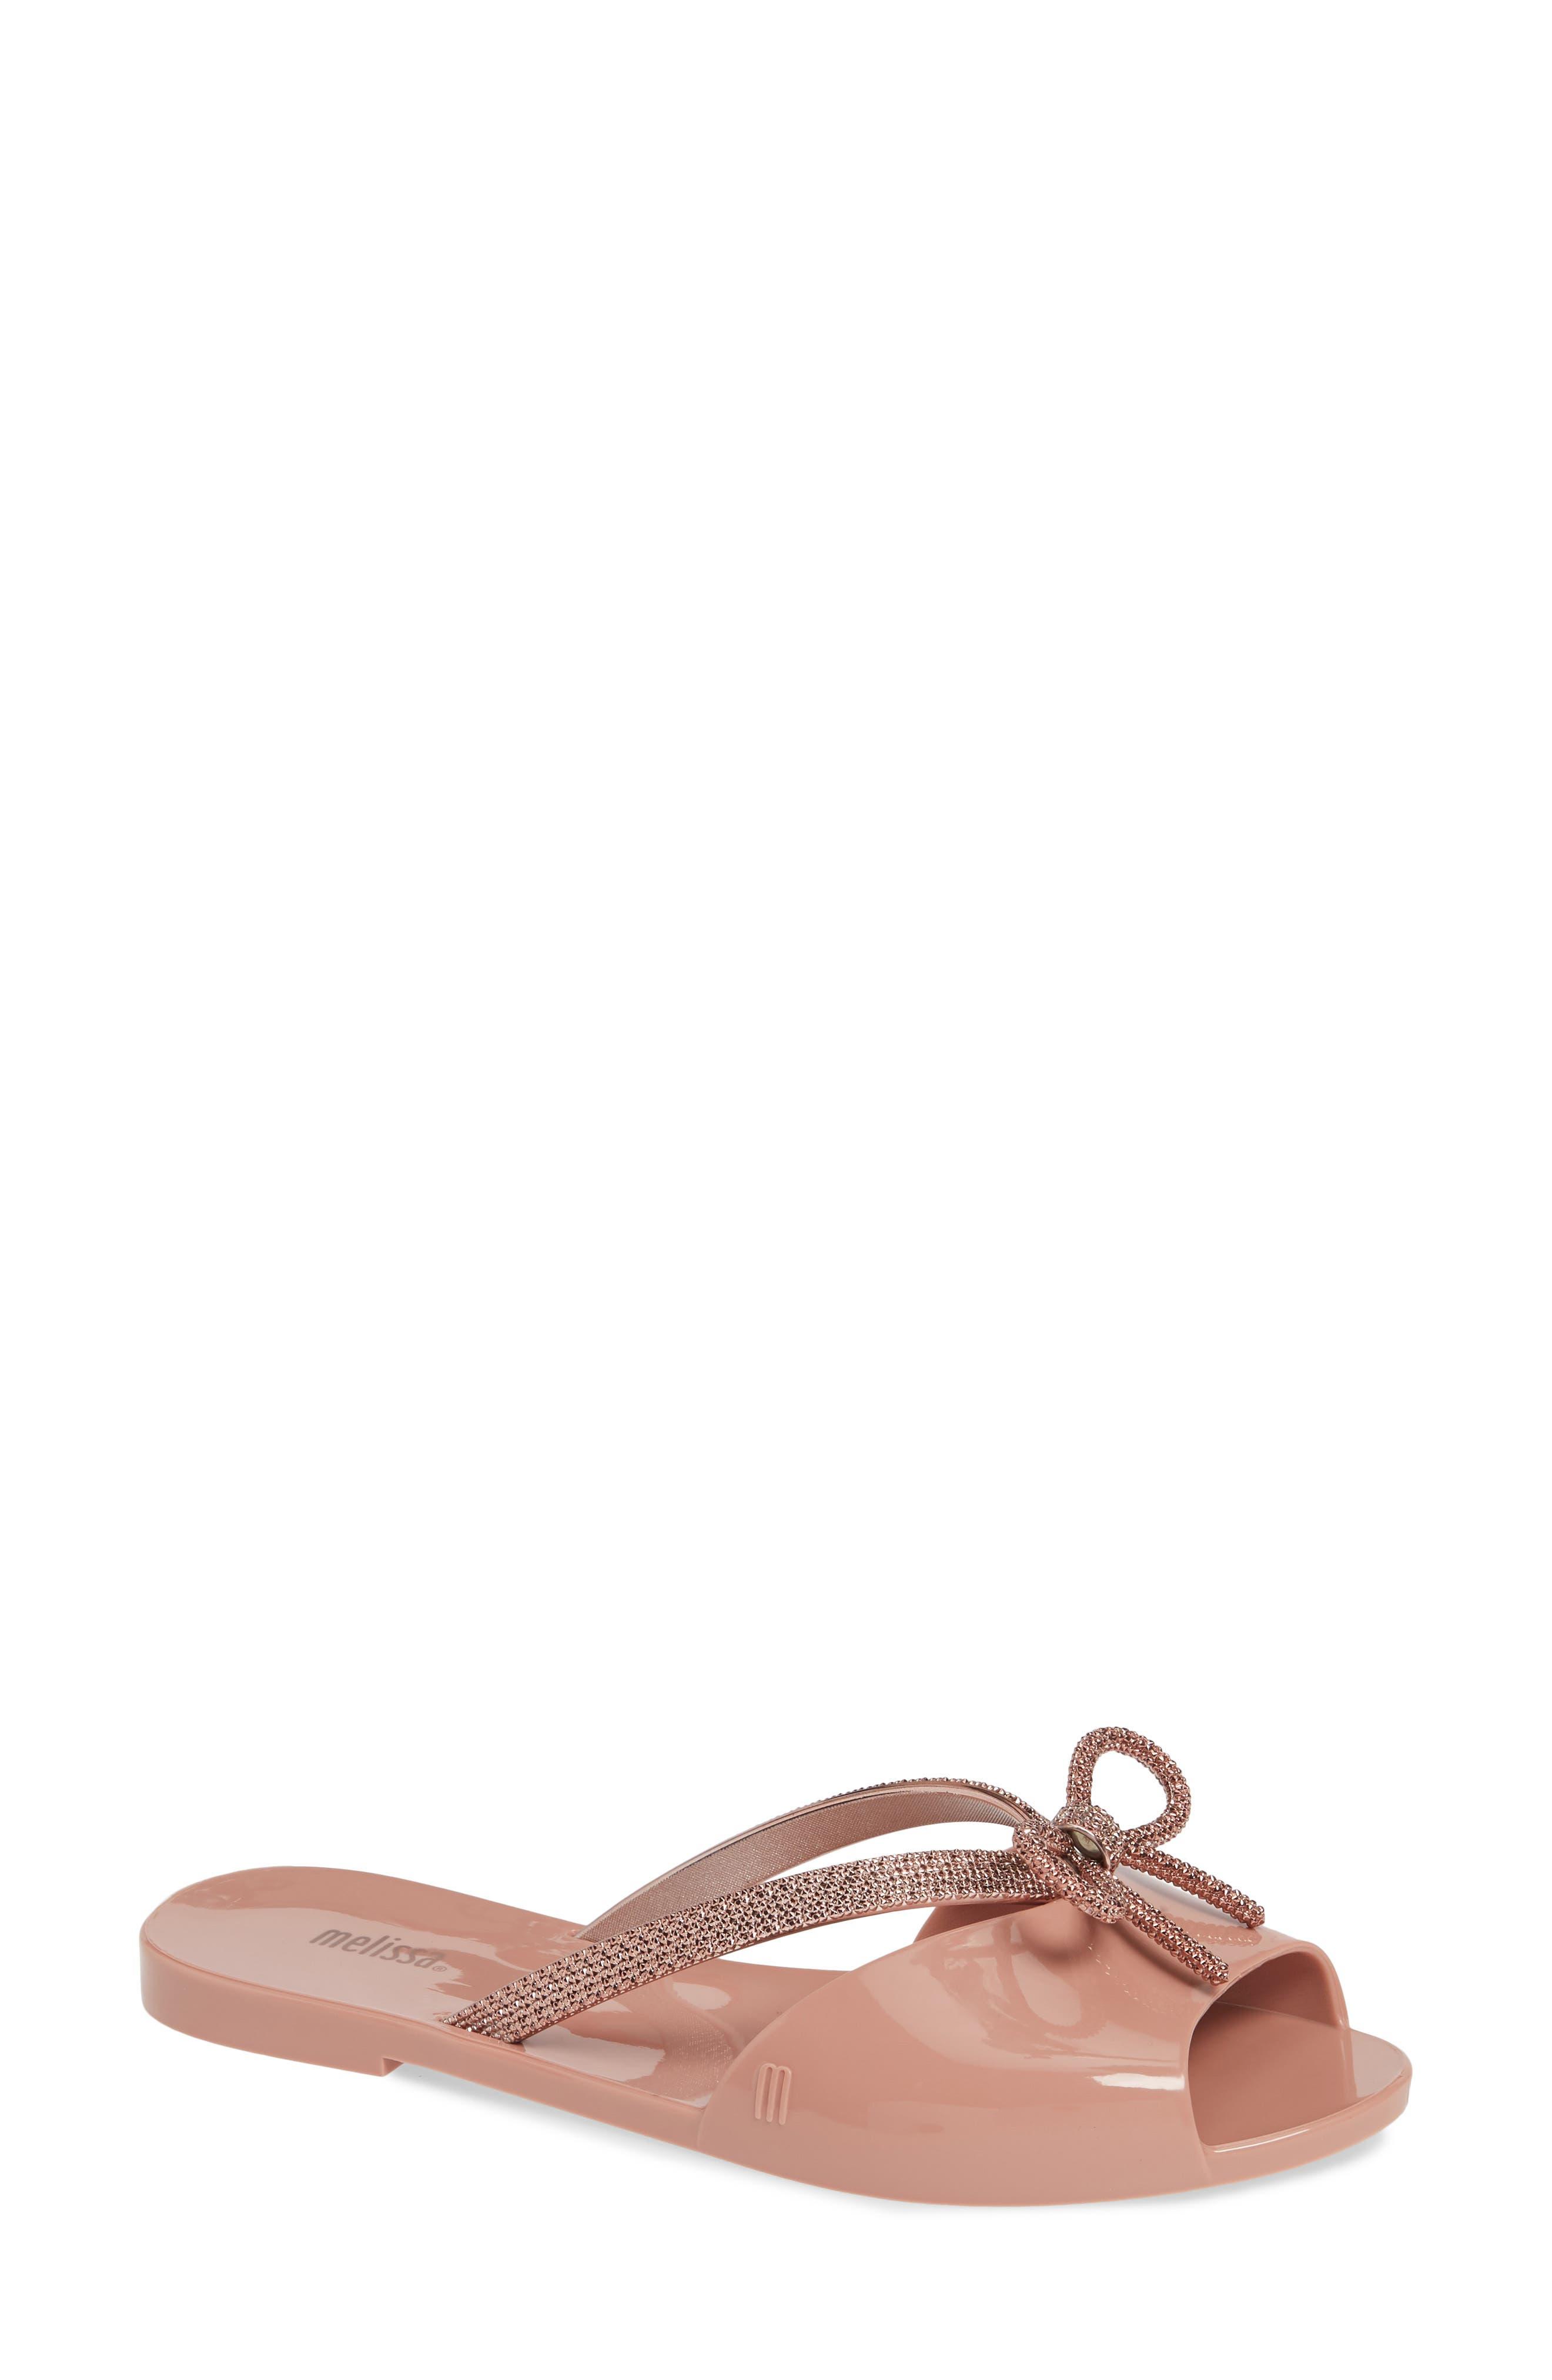 Women'S Ela Chrome Slide Sandals in Metallic Pink Rubber